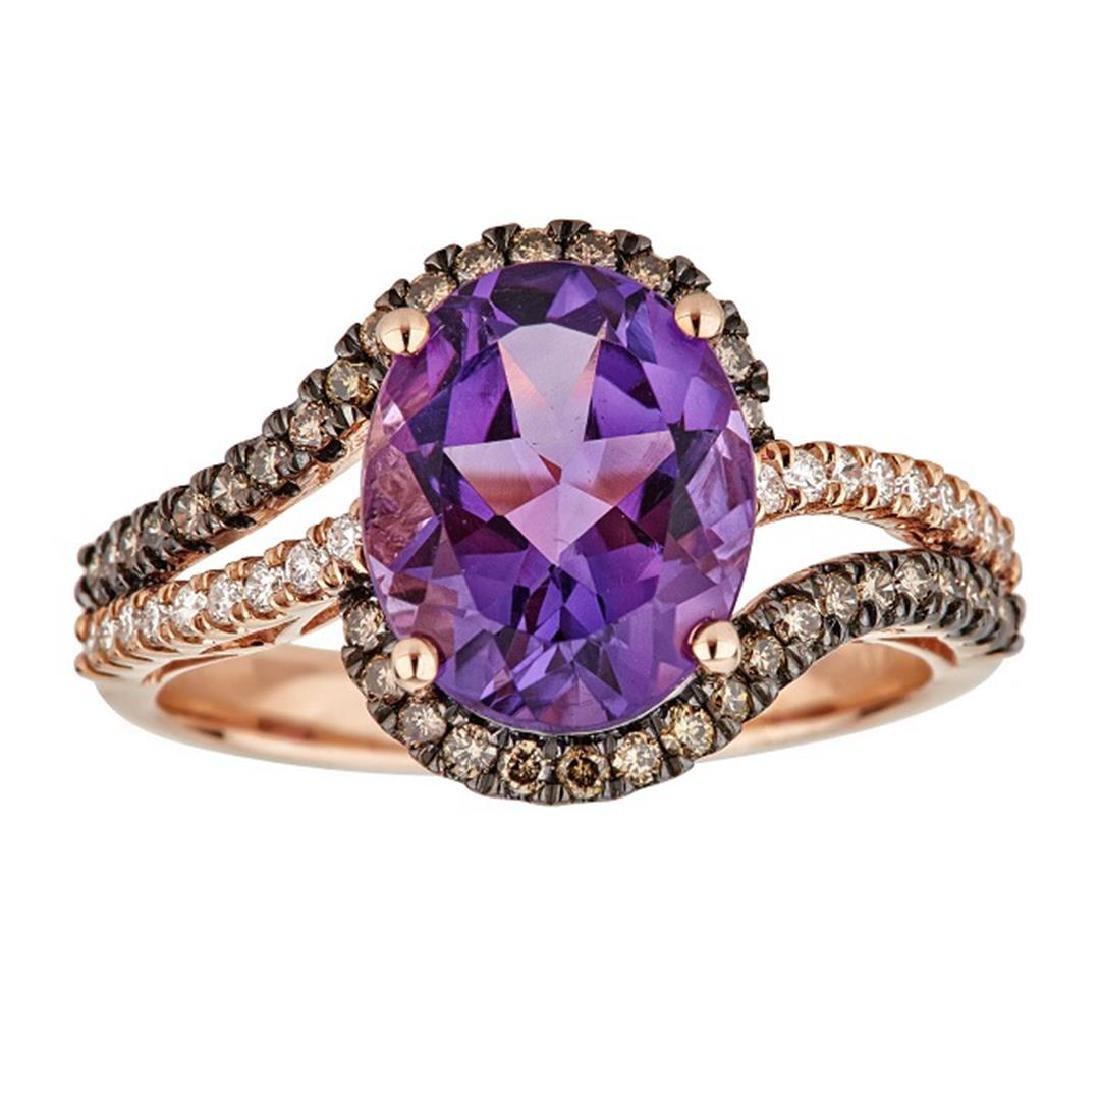 3.25 ctw Amethyst, Brown Diamond and Diamond Ring -